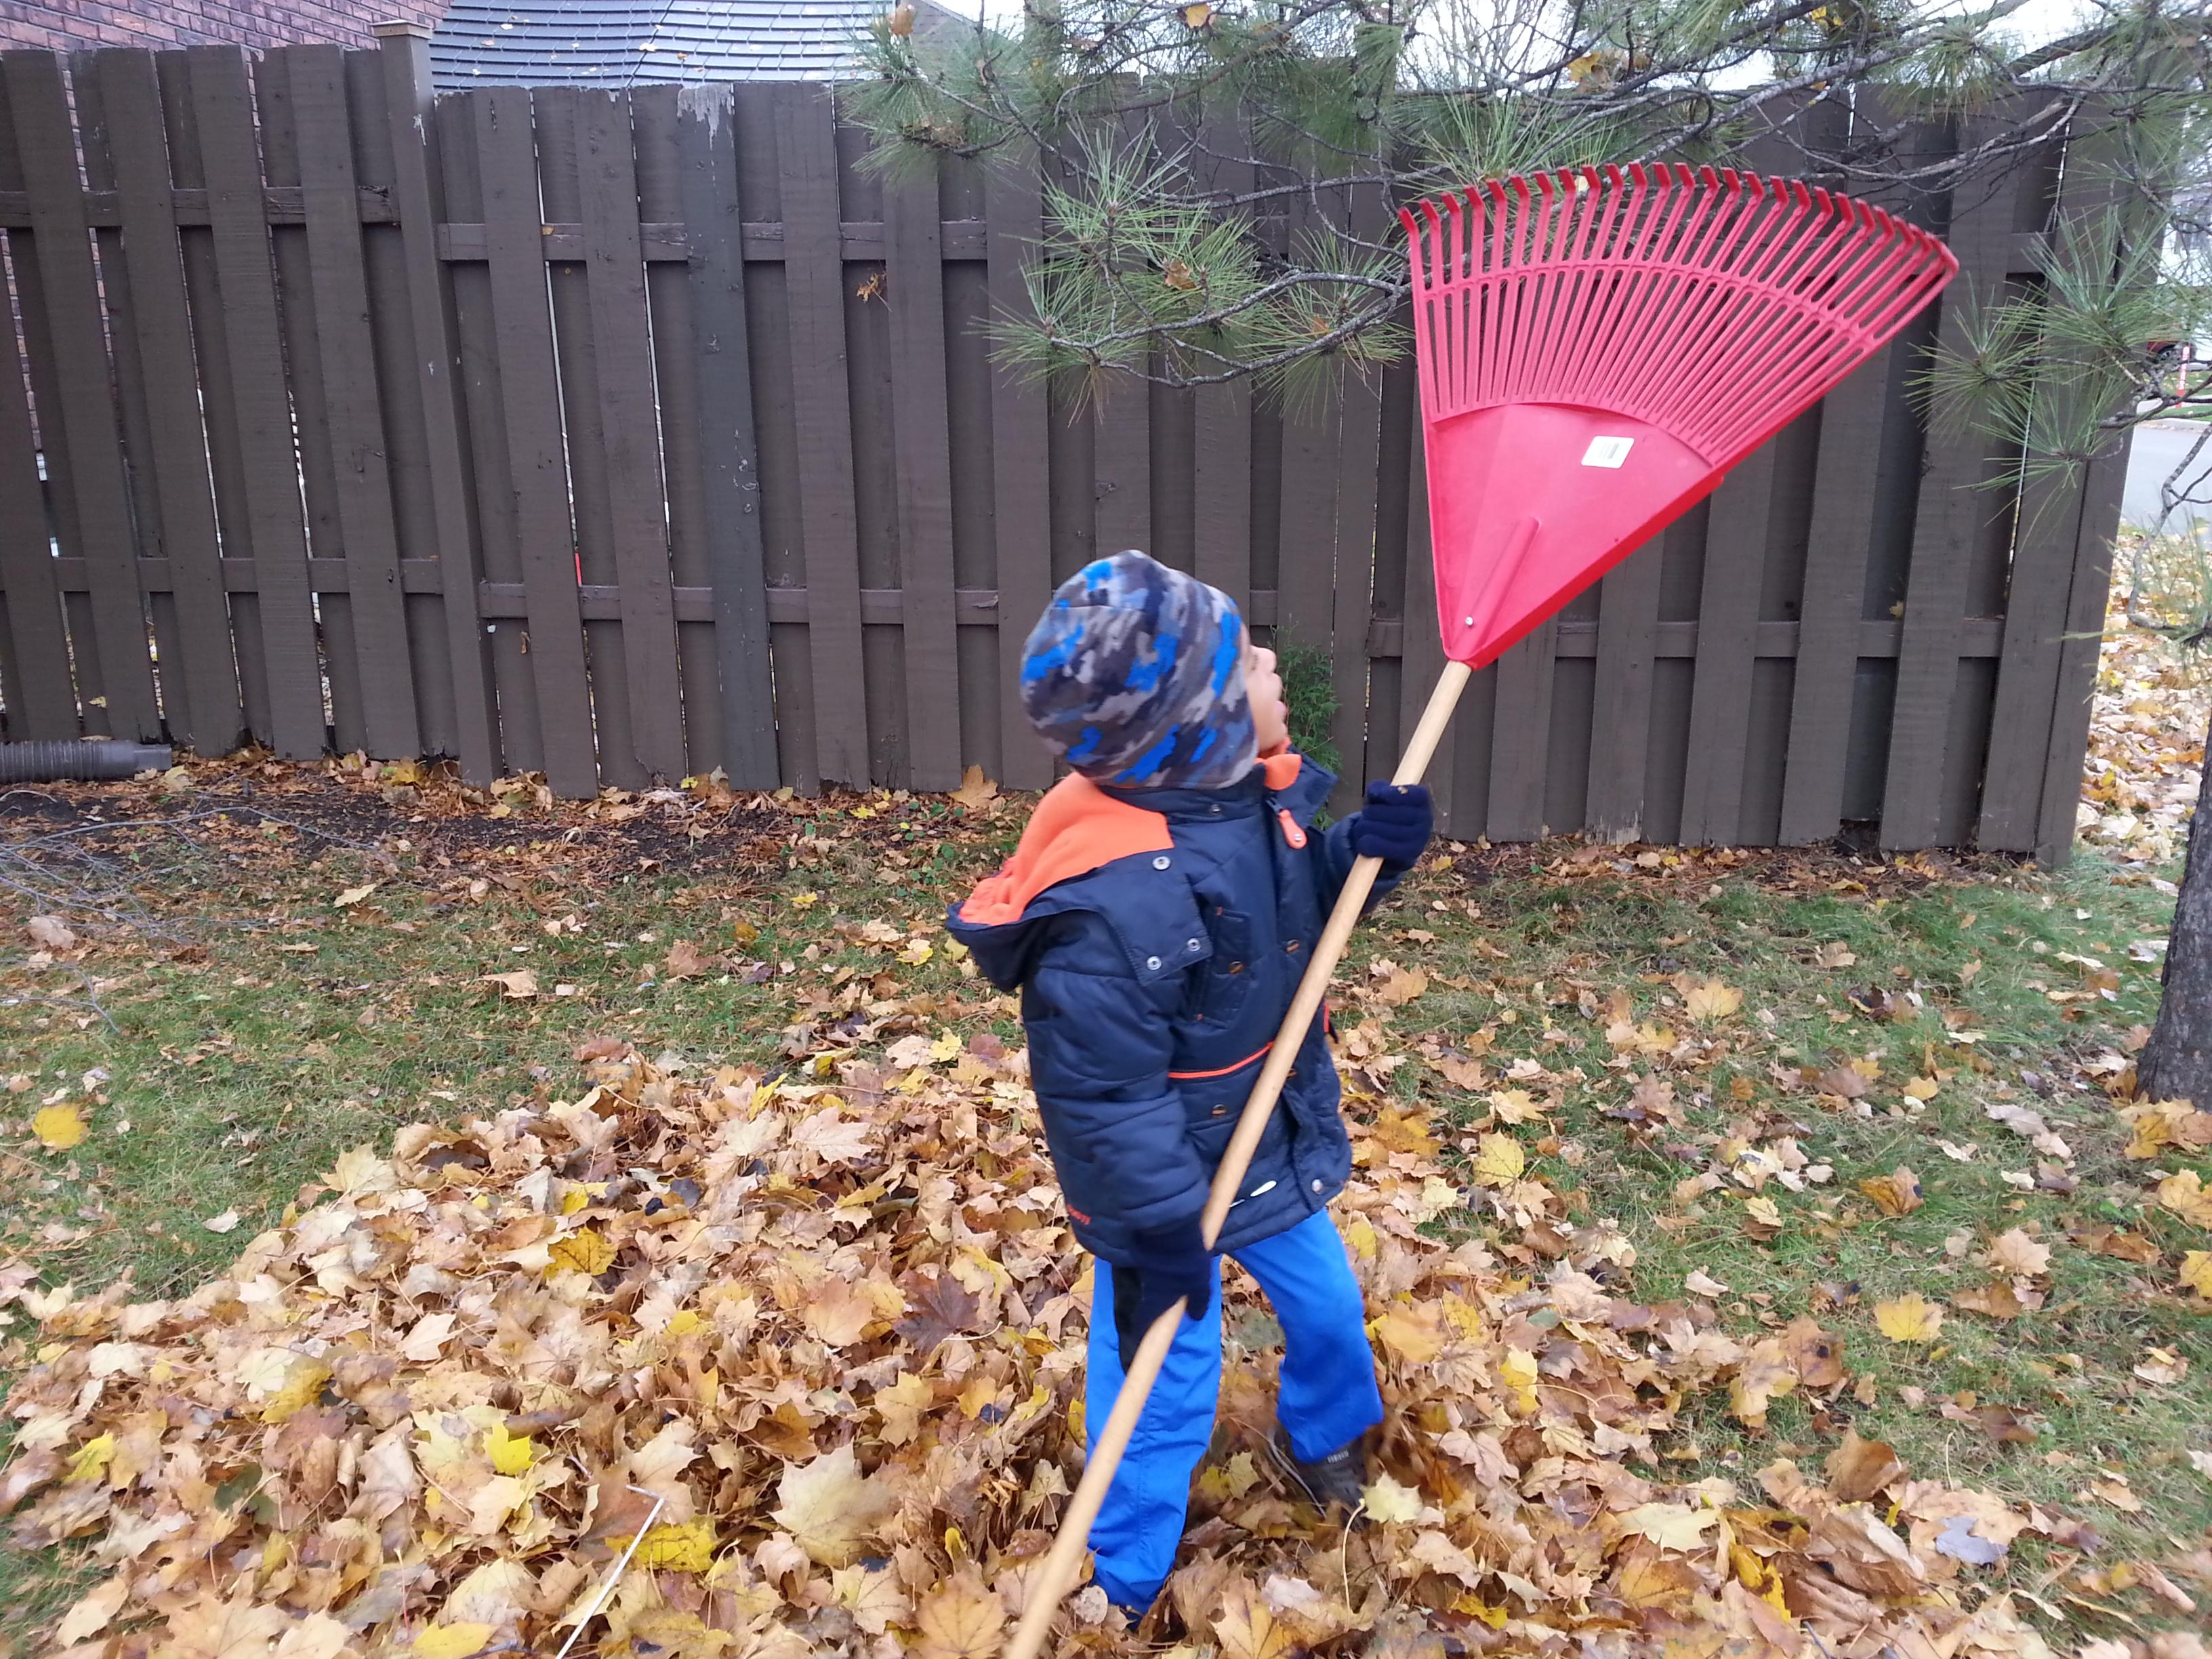 dr-sazini-Child-raking-leaves-in-the-Fall/Autumn